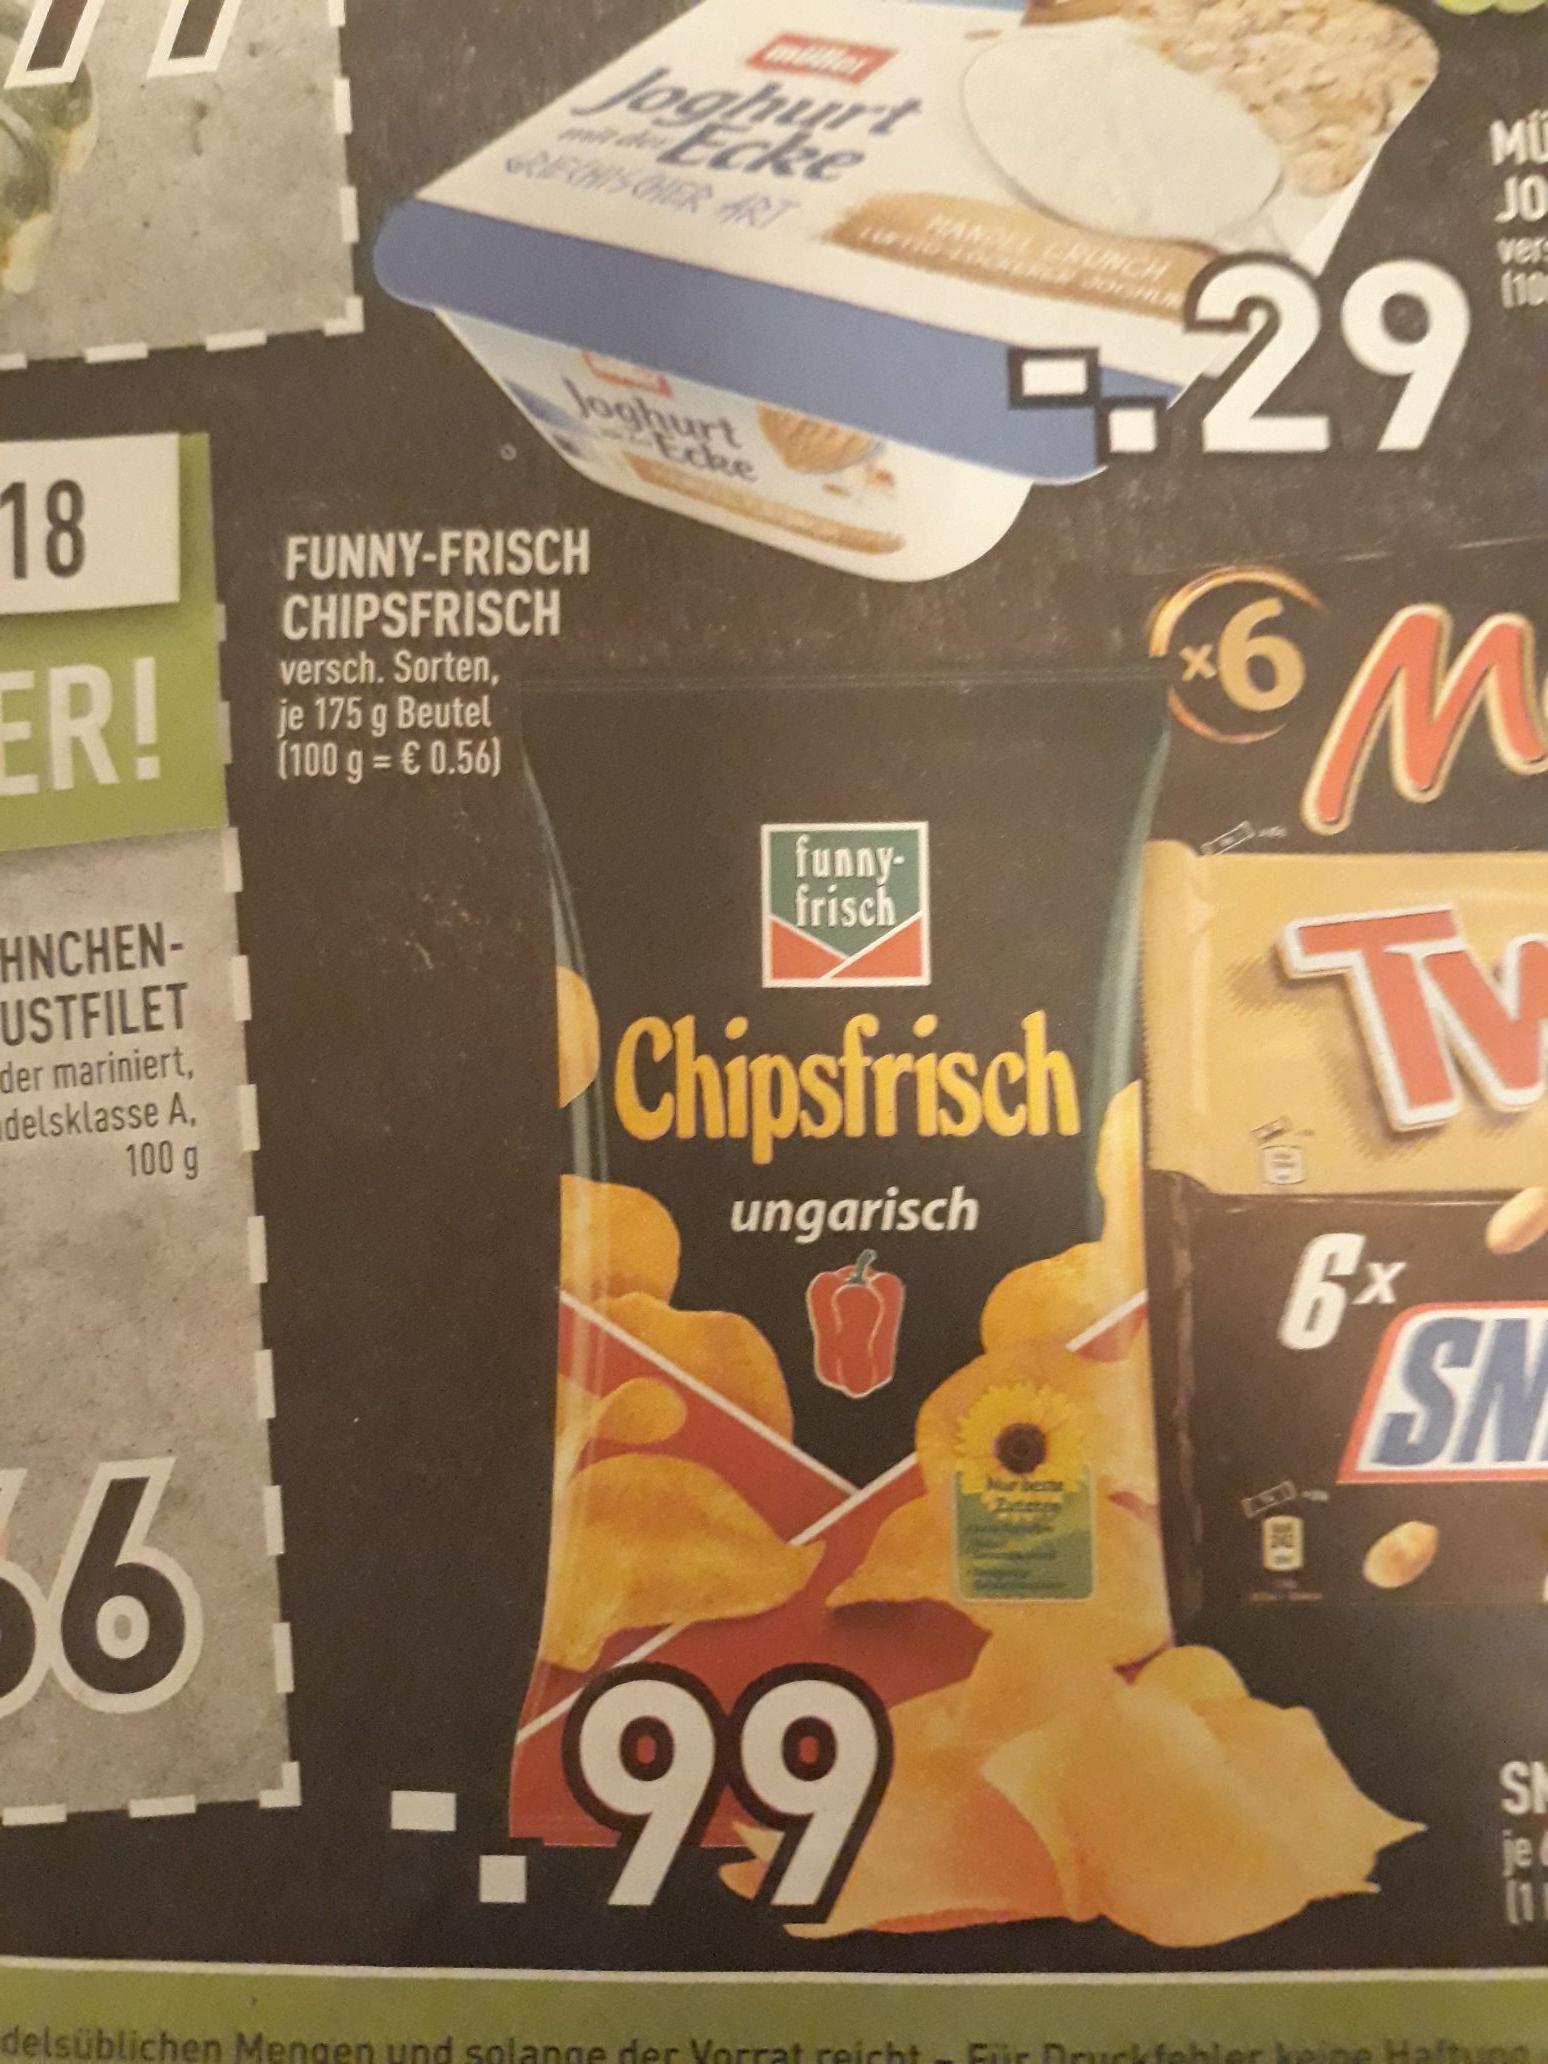 (Lokal) (Edeka App) funny-frisch Chipsfrisch 175gr verschiedene Sorten